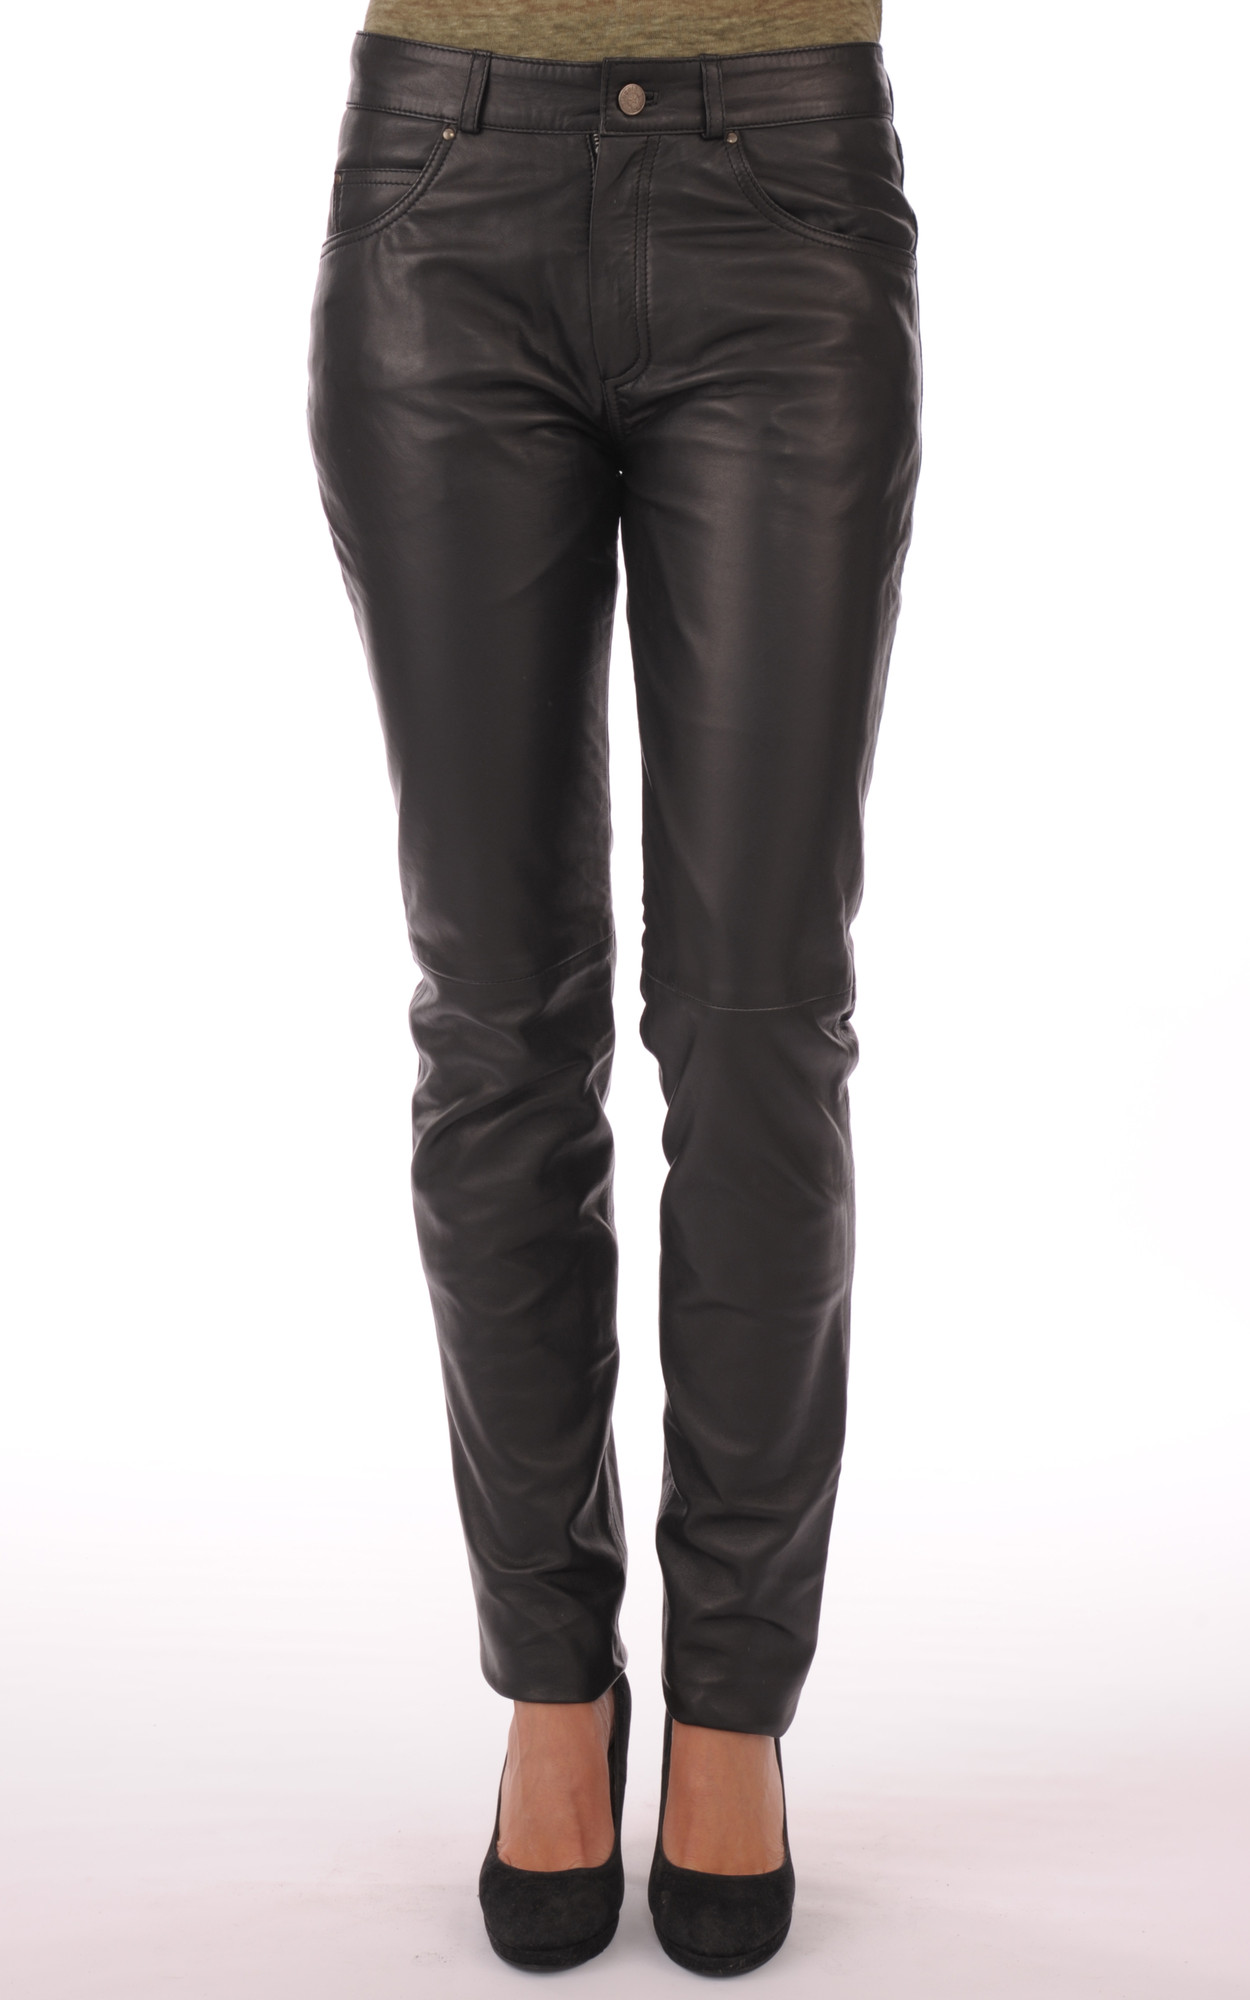 Pantalon En Cuir Noir Femme1